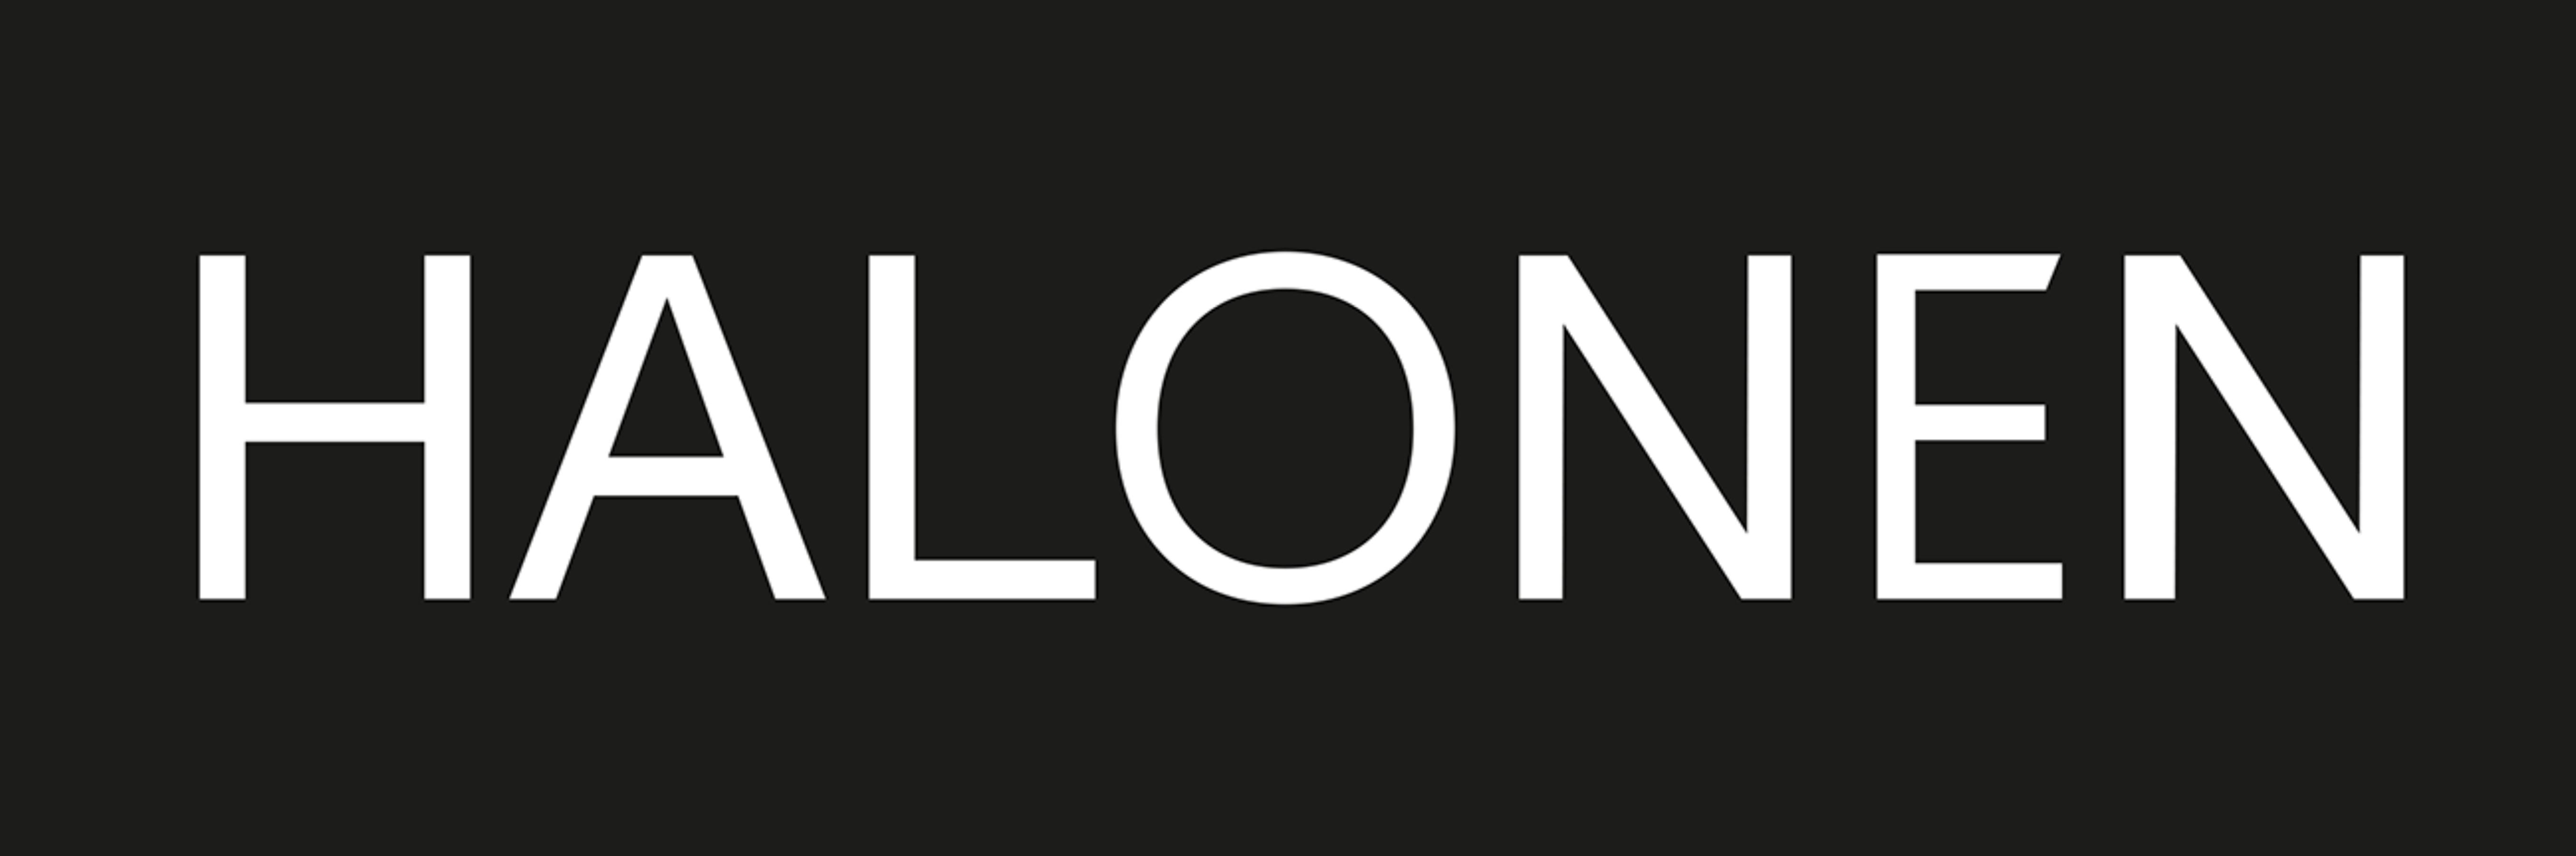 Halonen logo